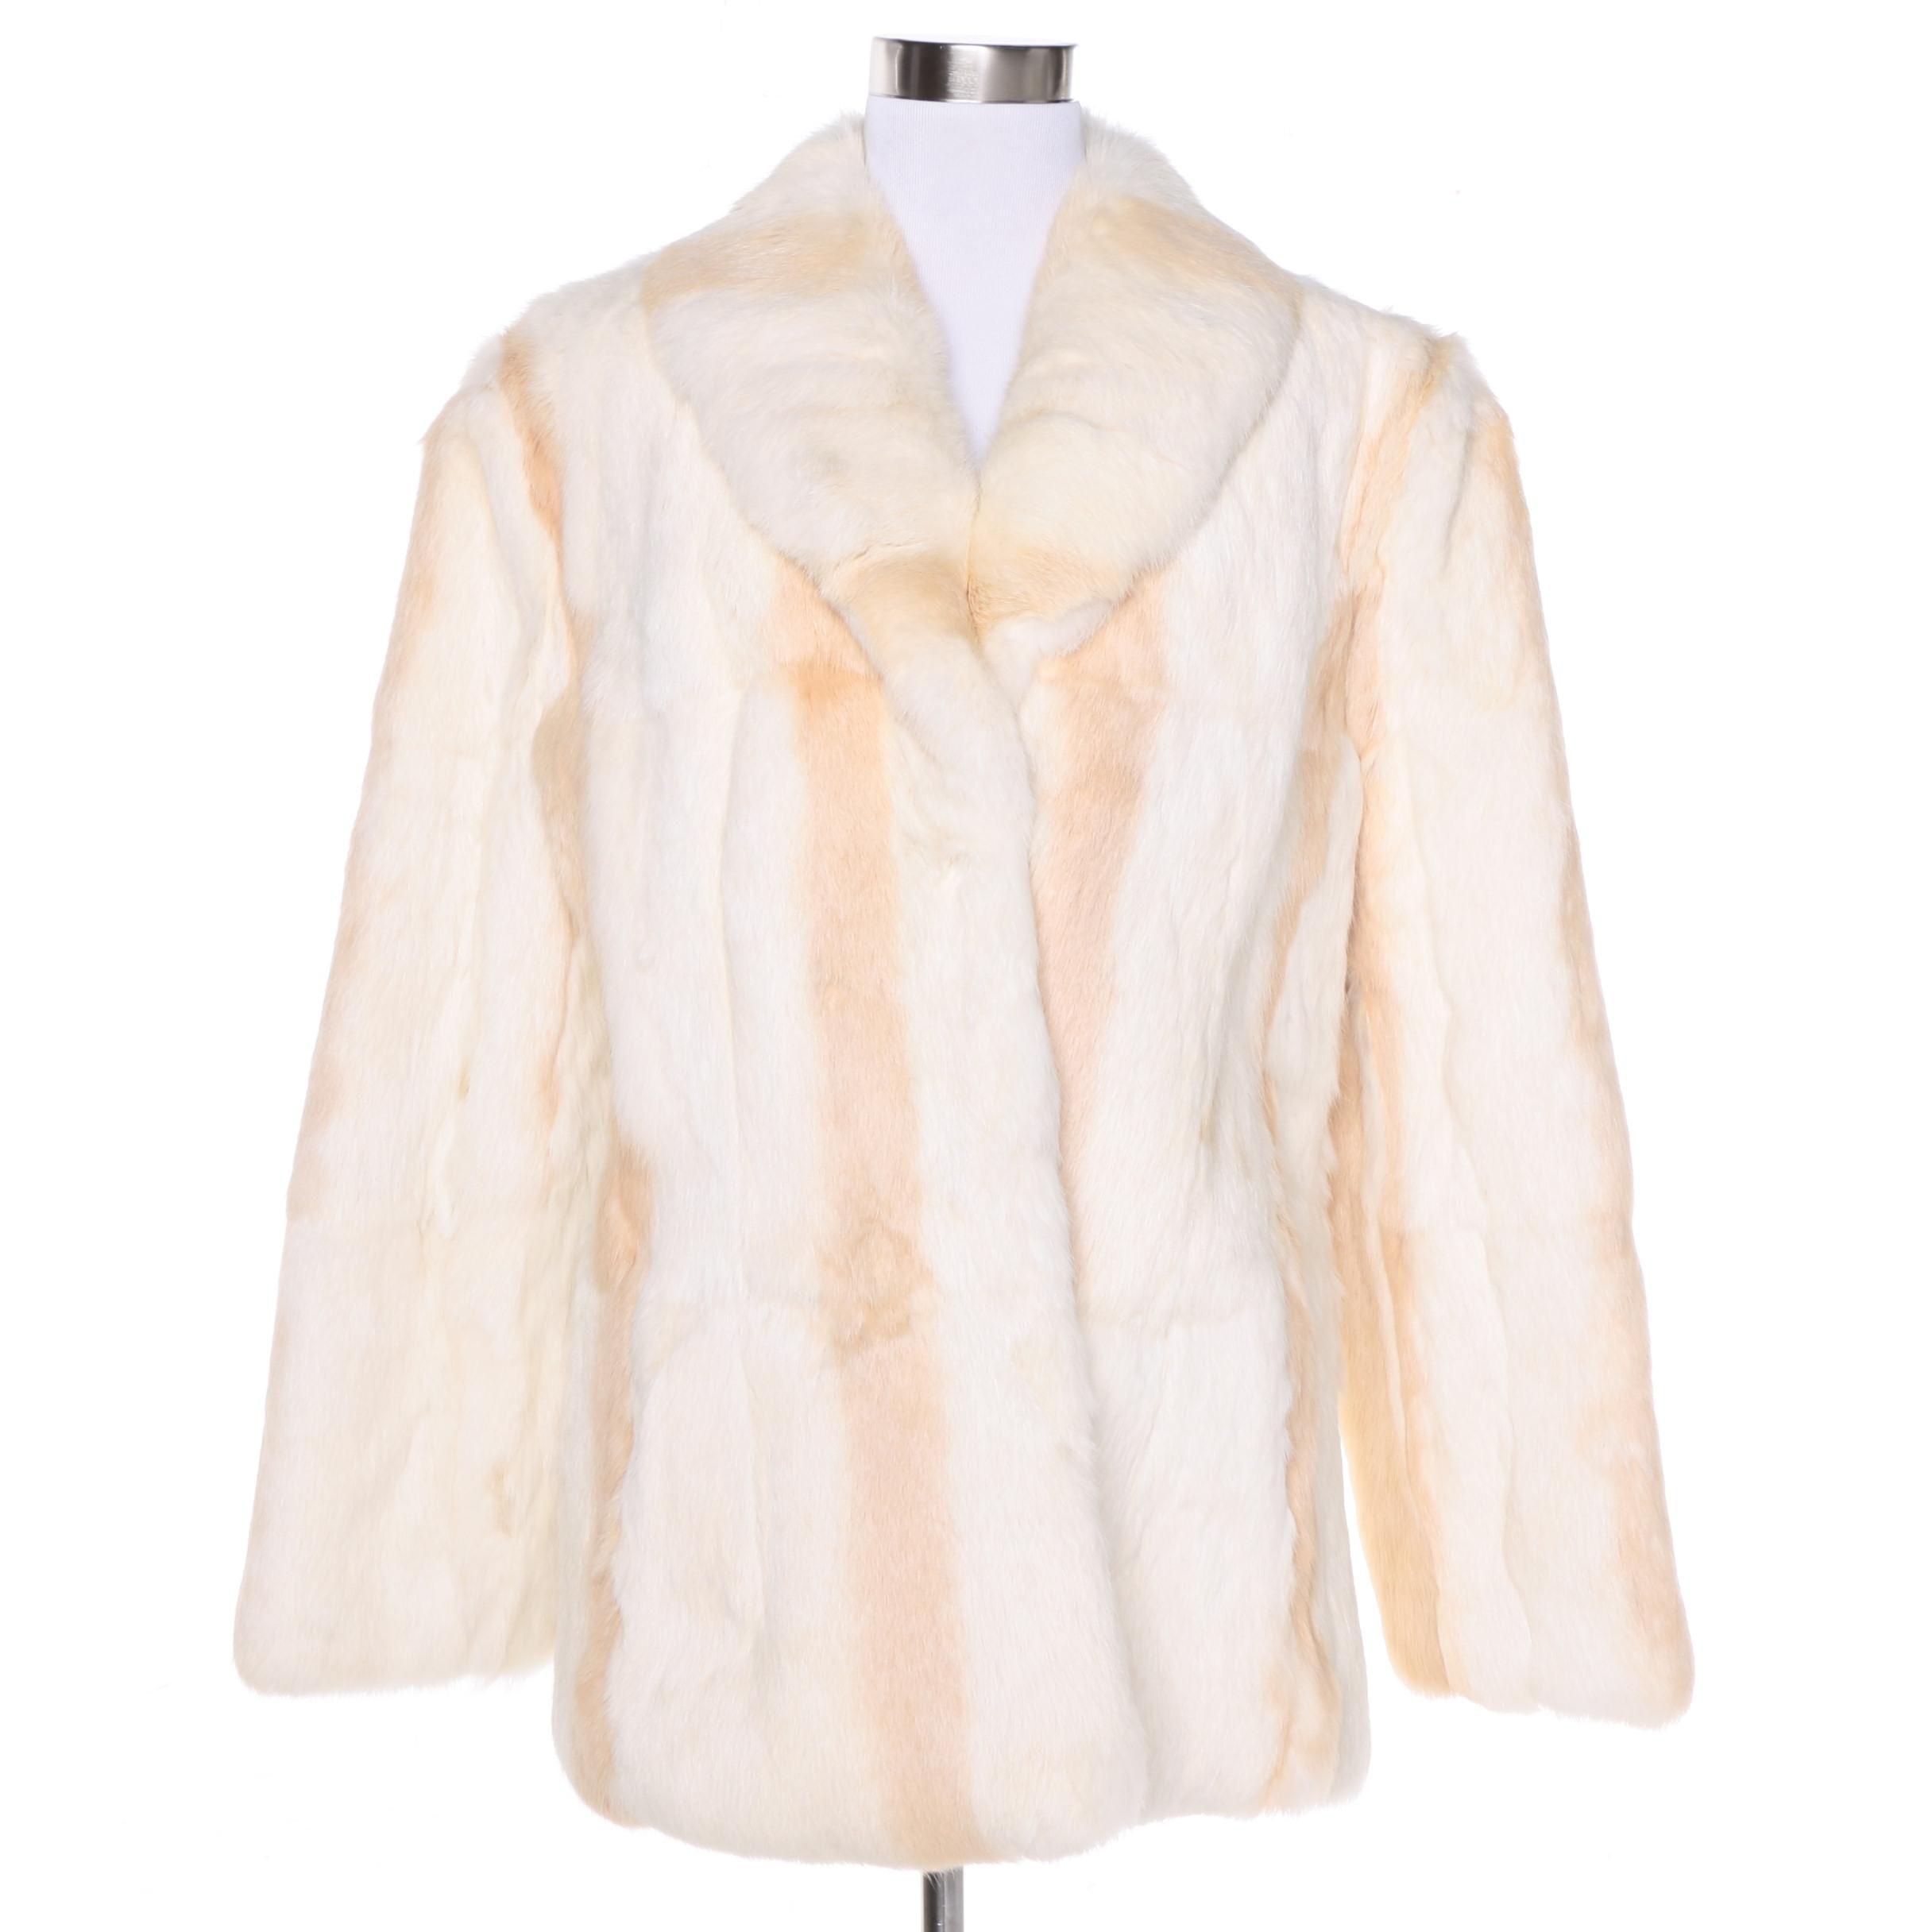 Dyed Rabbit Fur Coat